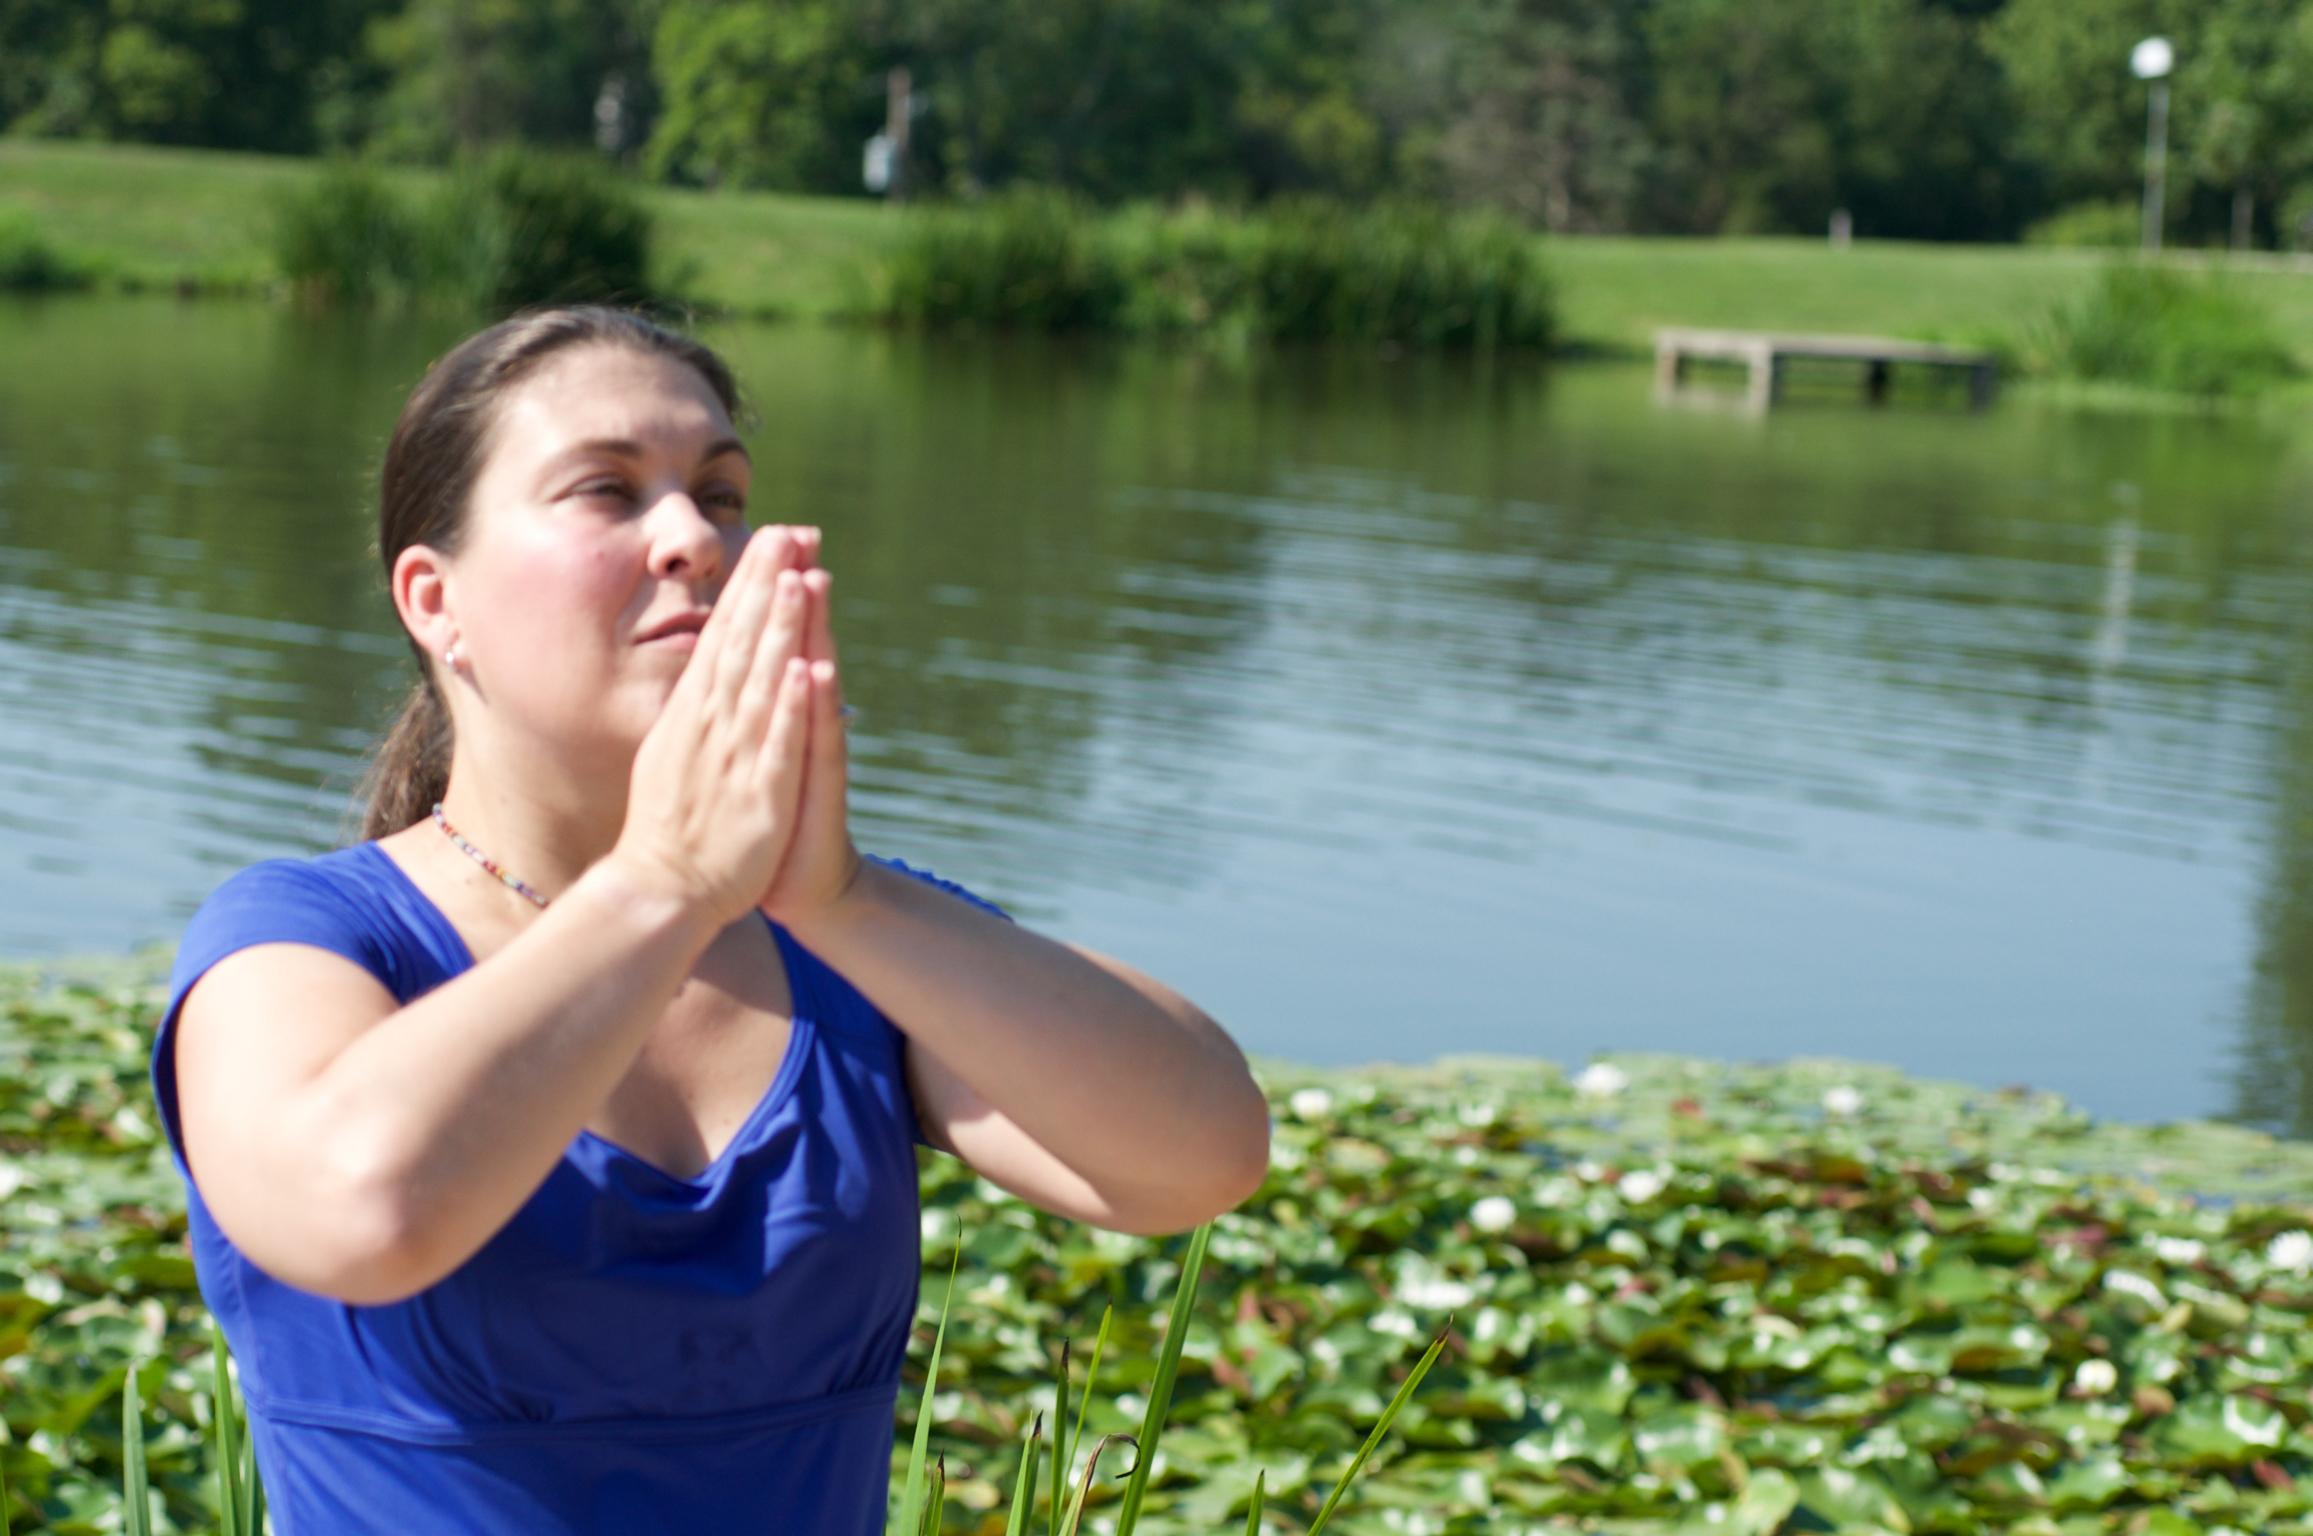 It's Your Yoga Journey